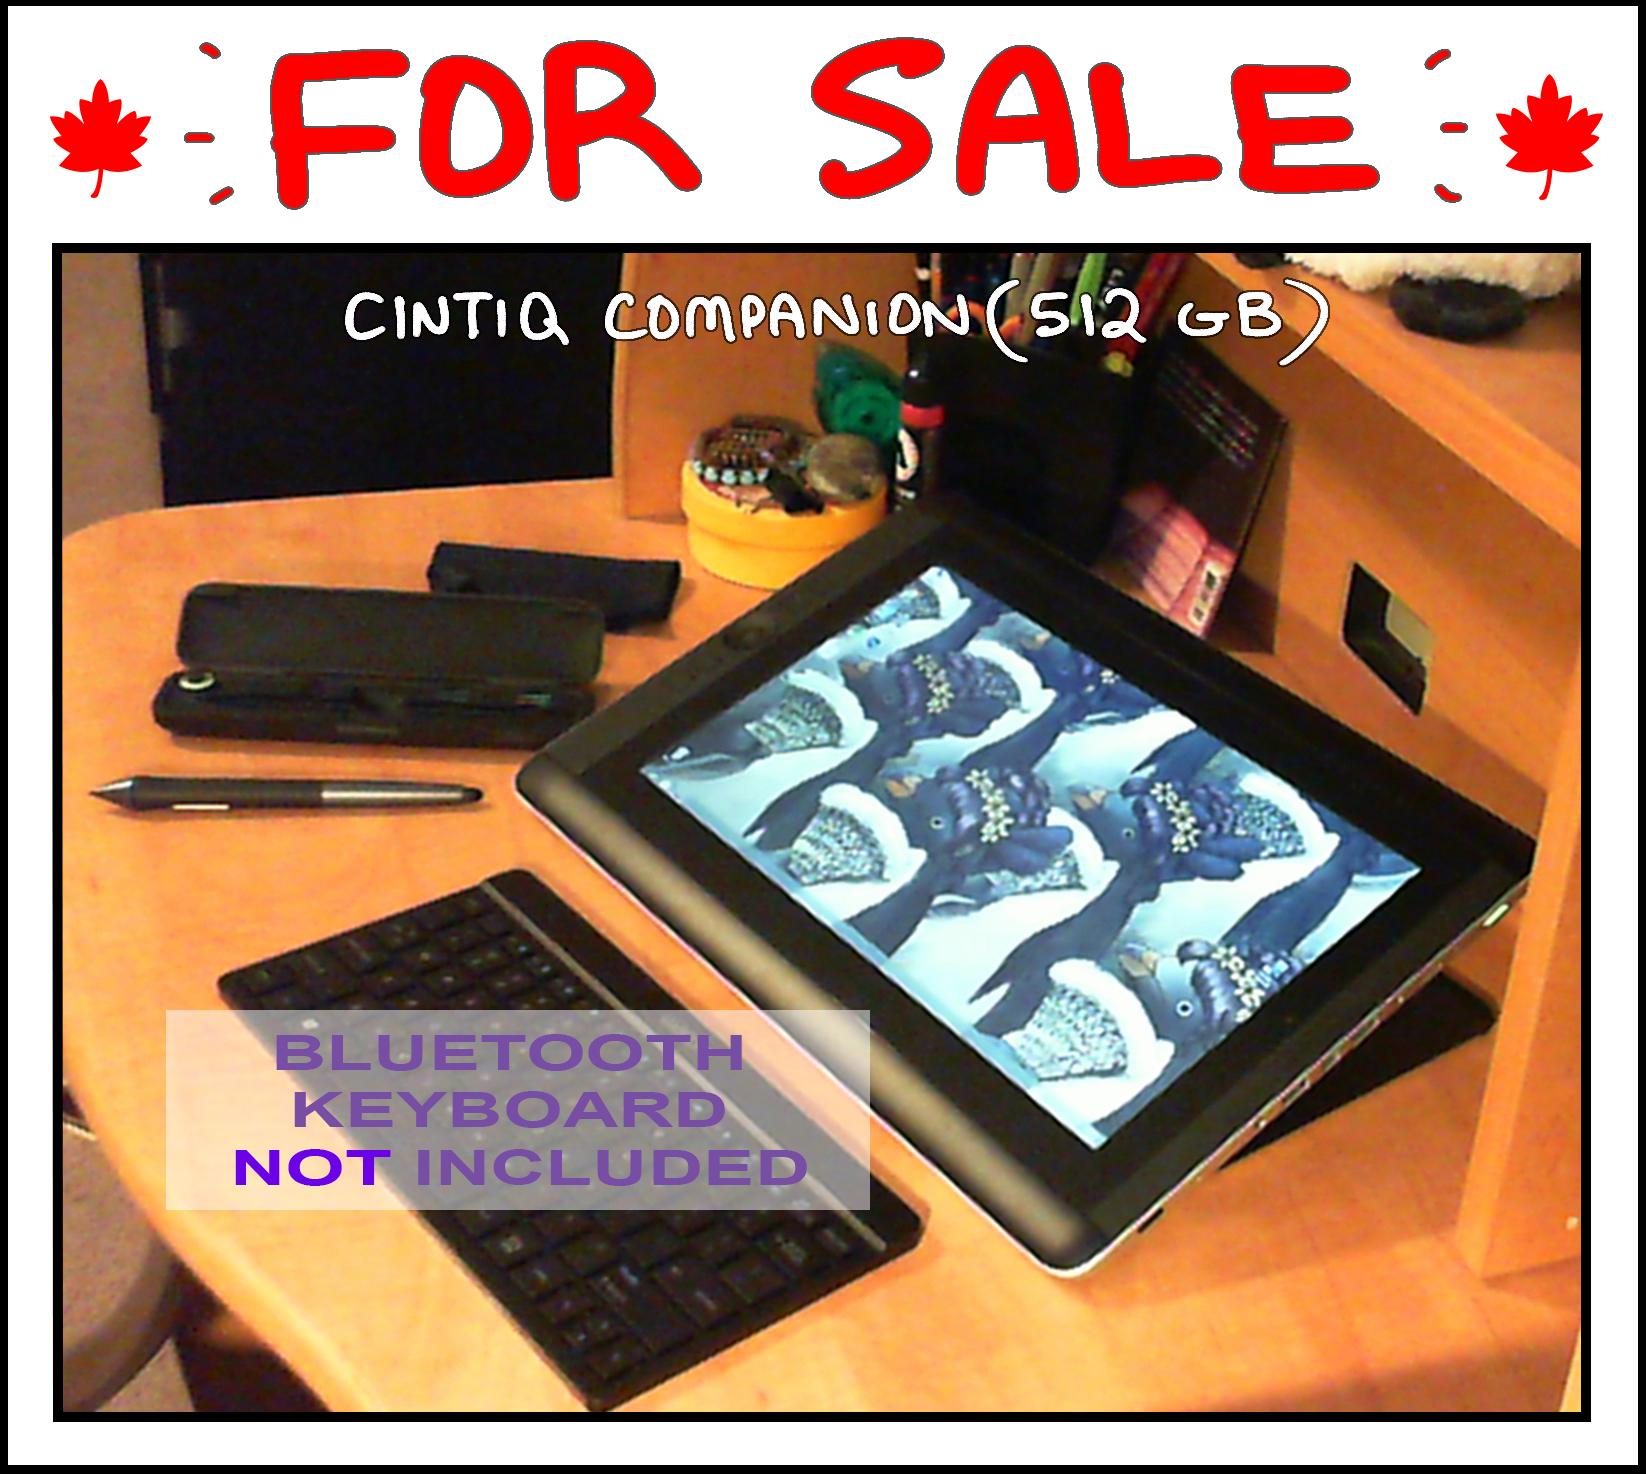 2916822_143570497613_CintiqCompanion-ContentsExamplePhotoderp.jpg